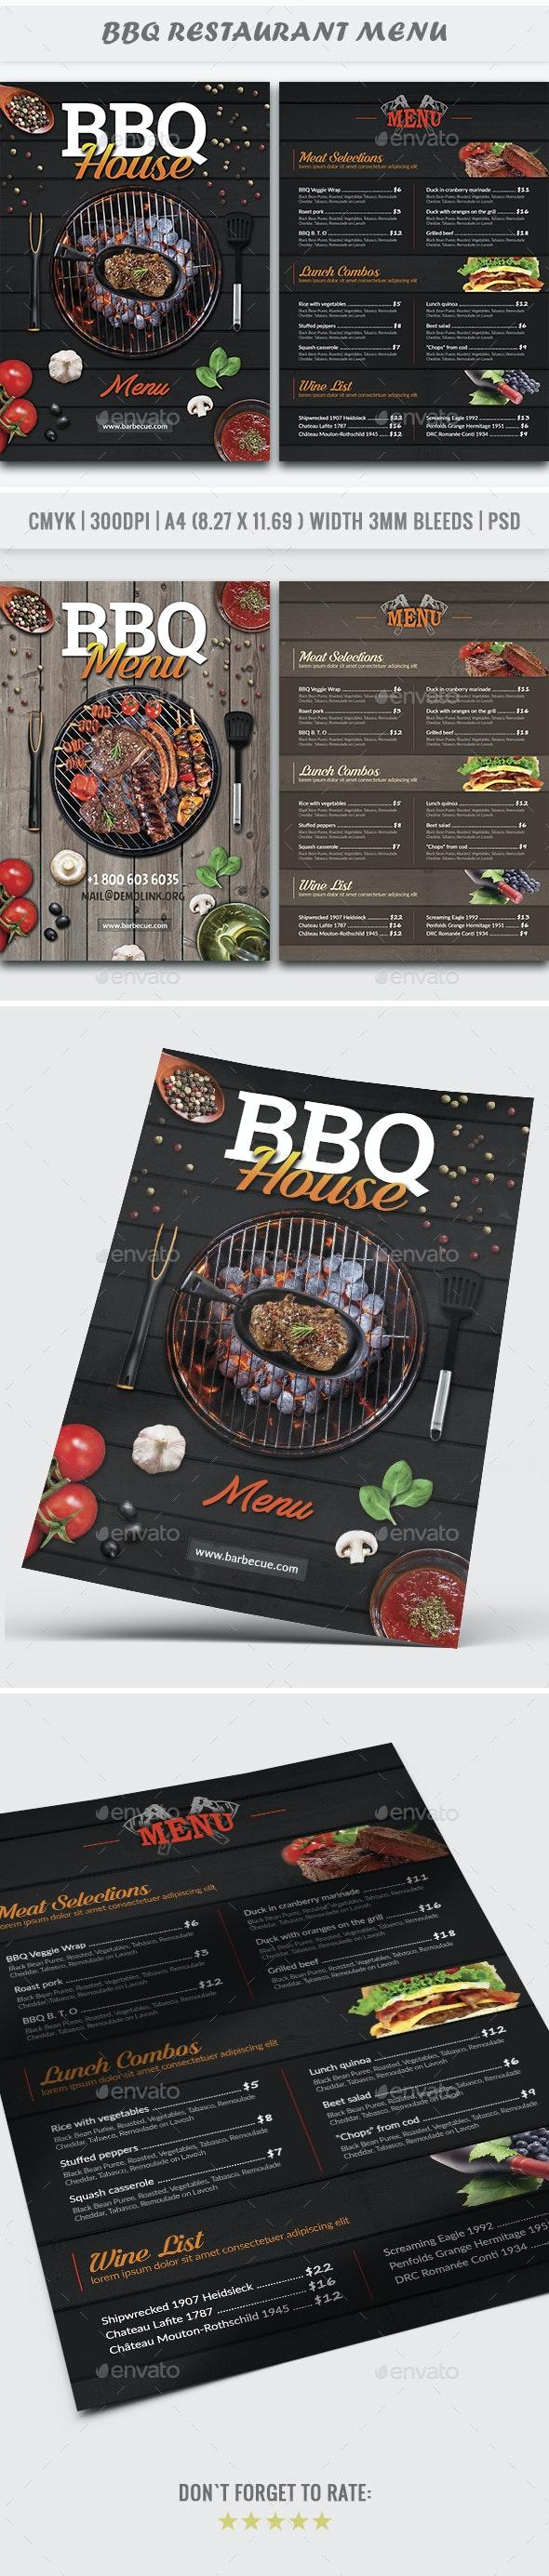 BBQ House Menu Flyer - Restaurant Flyers